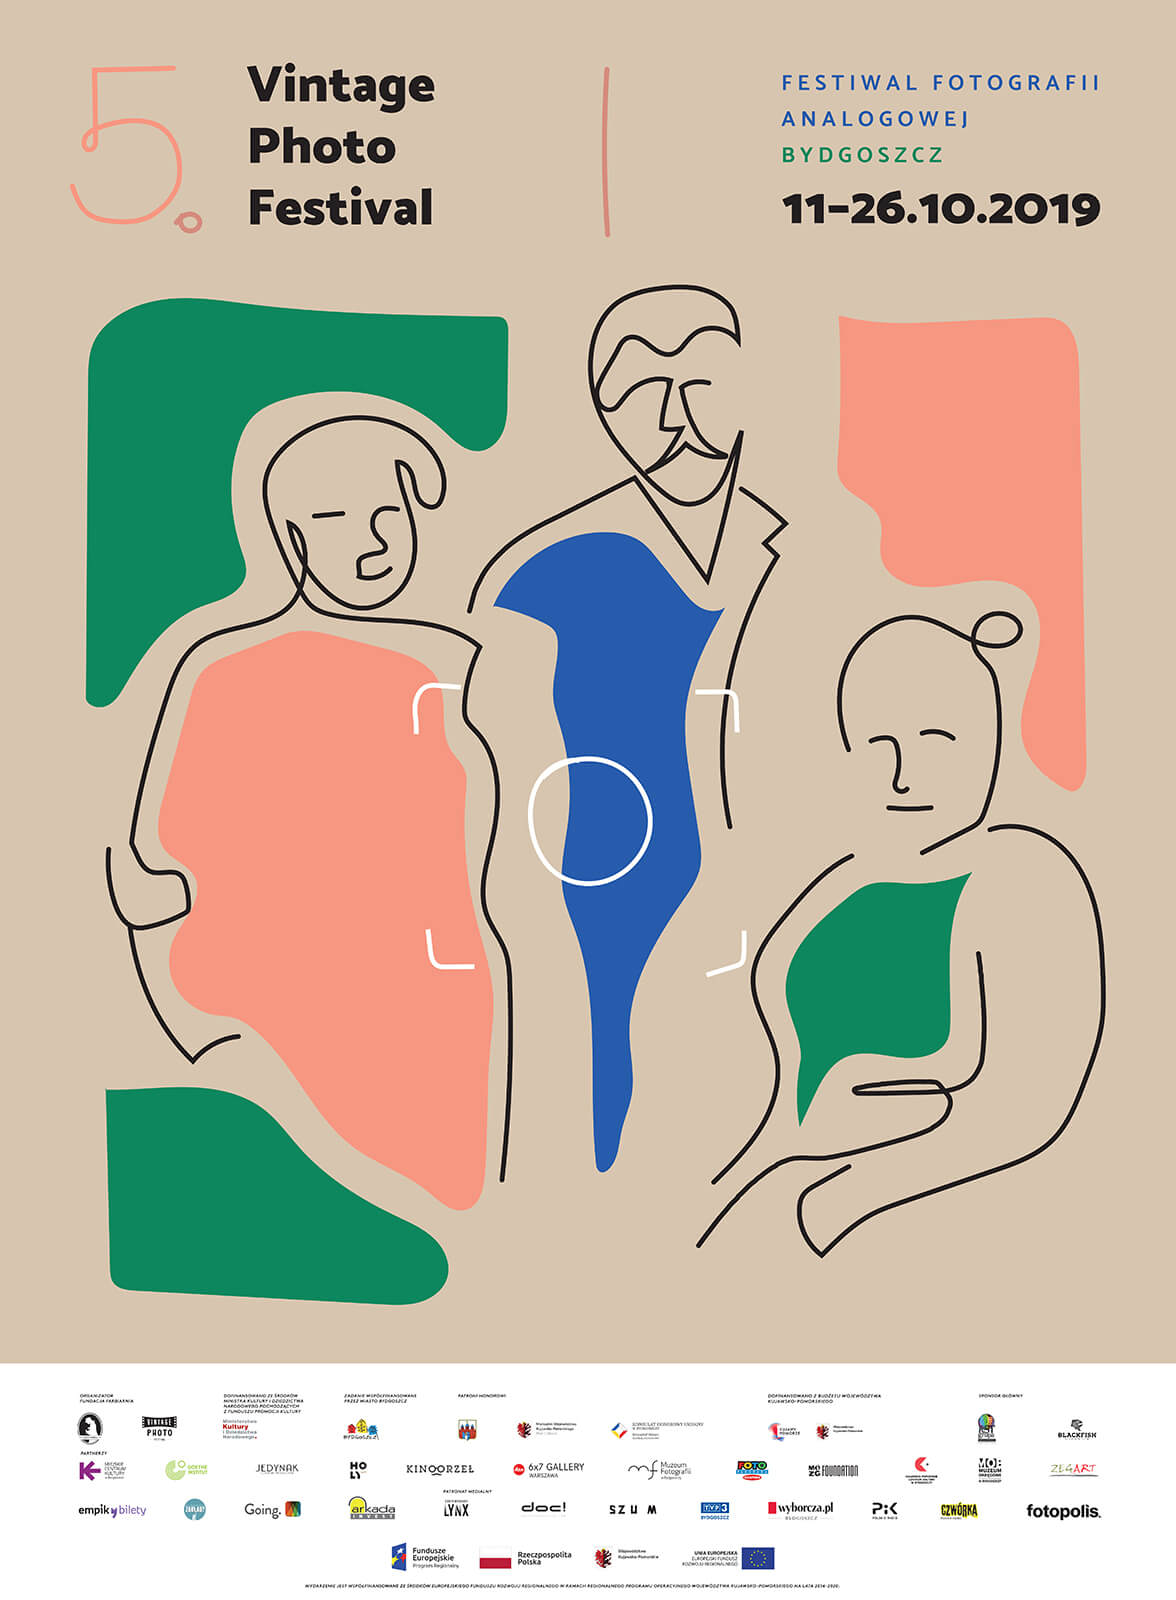 5. Vintage Photo Festival 2019